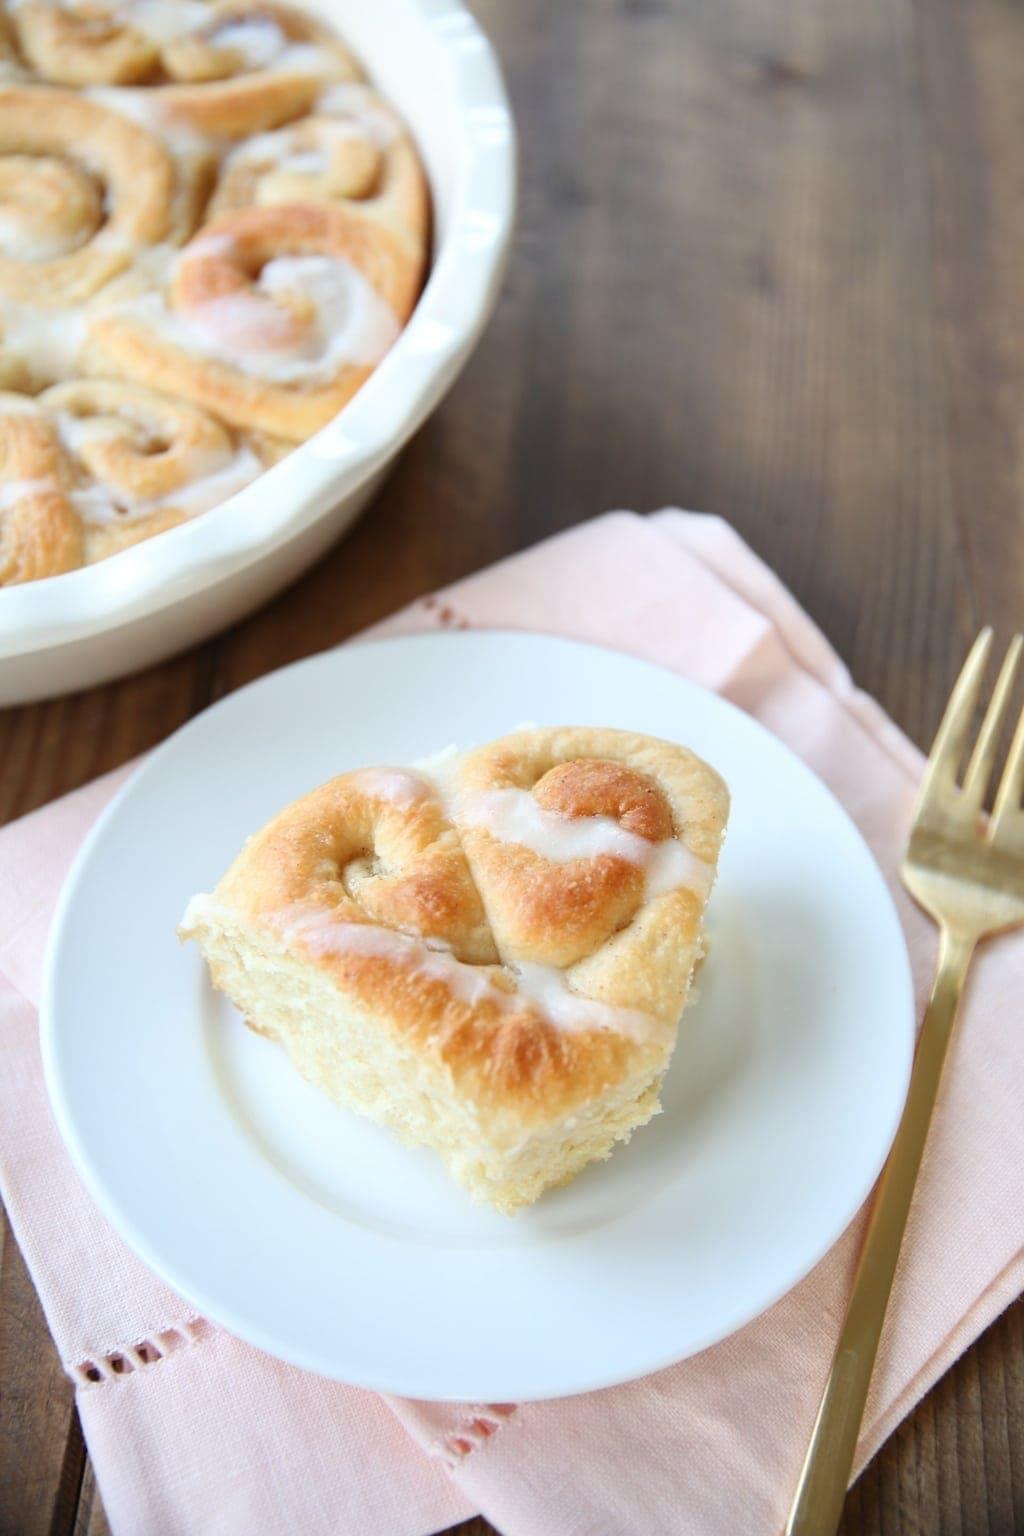 Amazing bakery thick cinnamon rolls